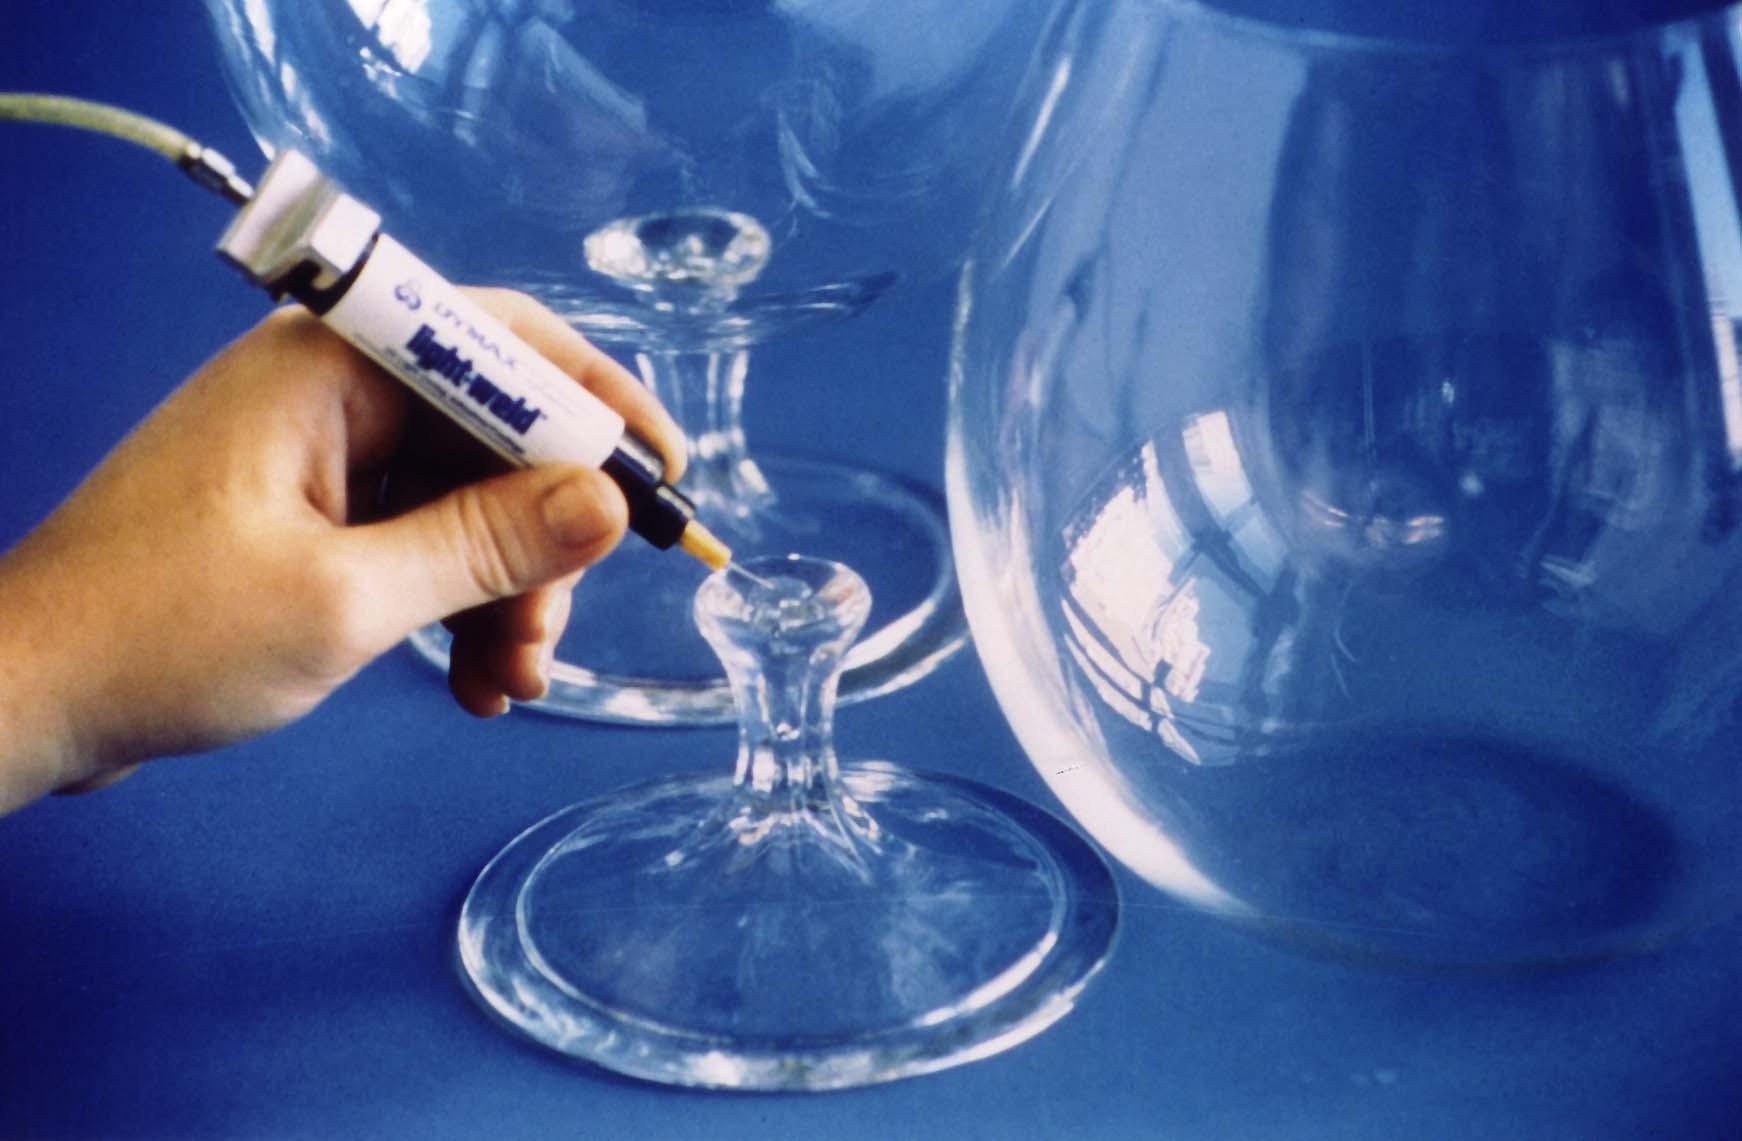 Uv Curing Glass Bonding Adhesives Www Intertronics Co Uk